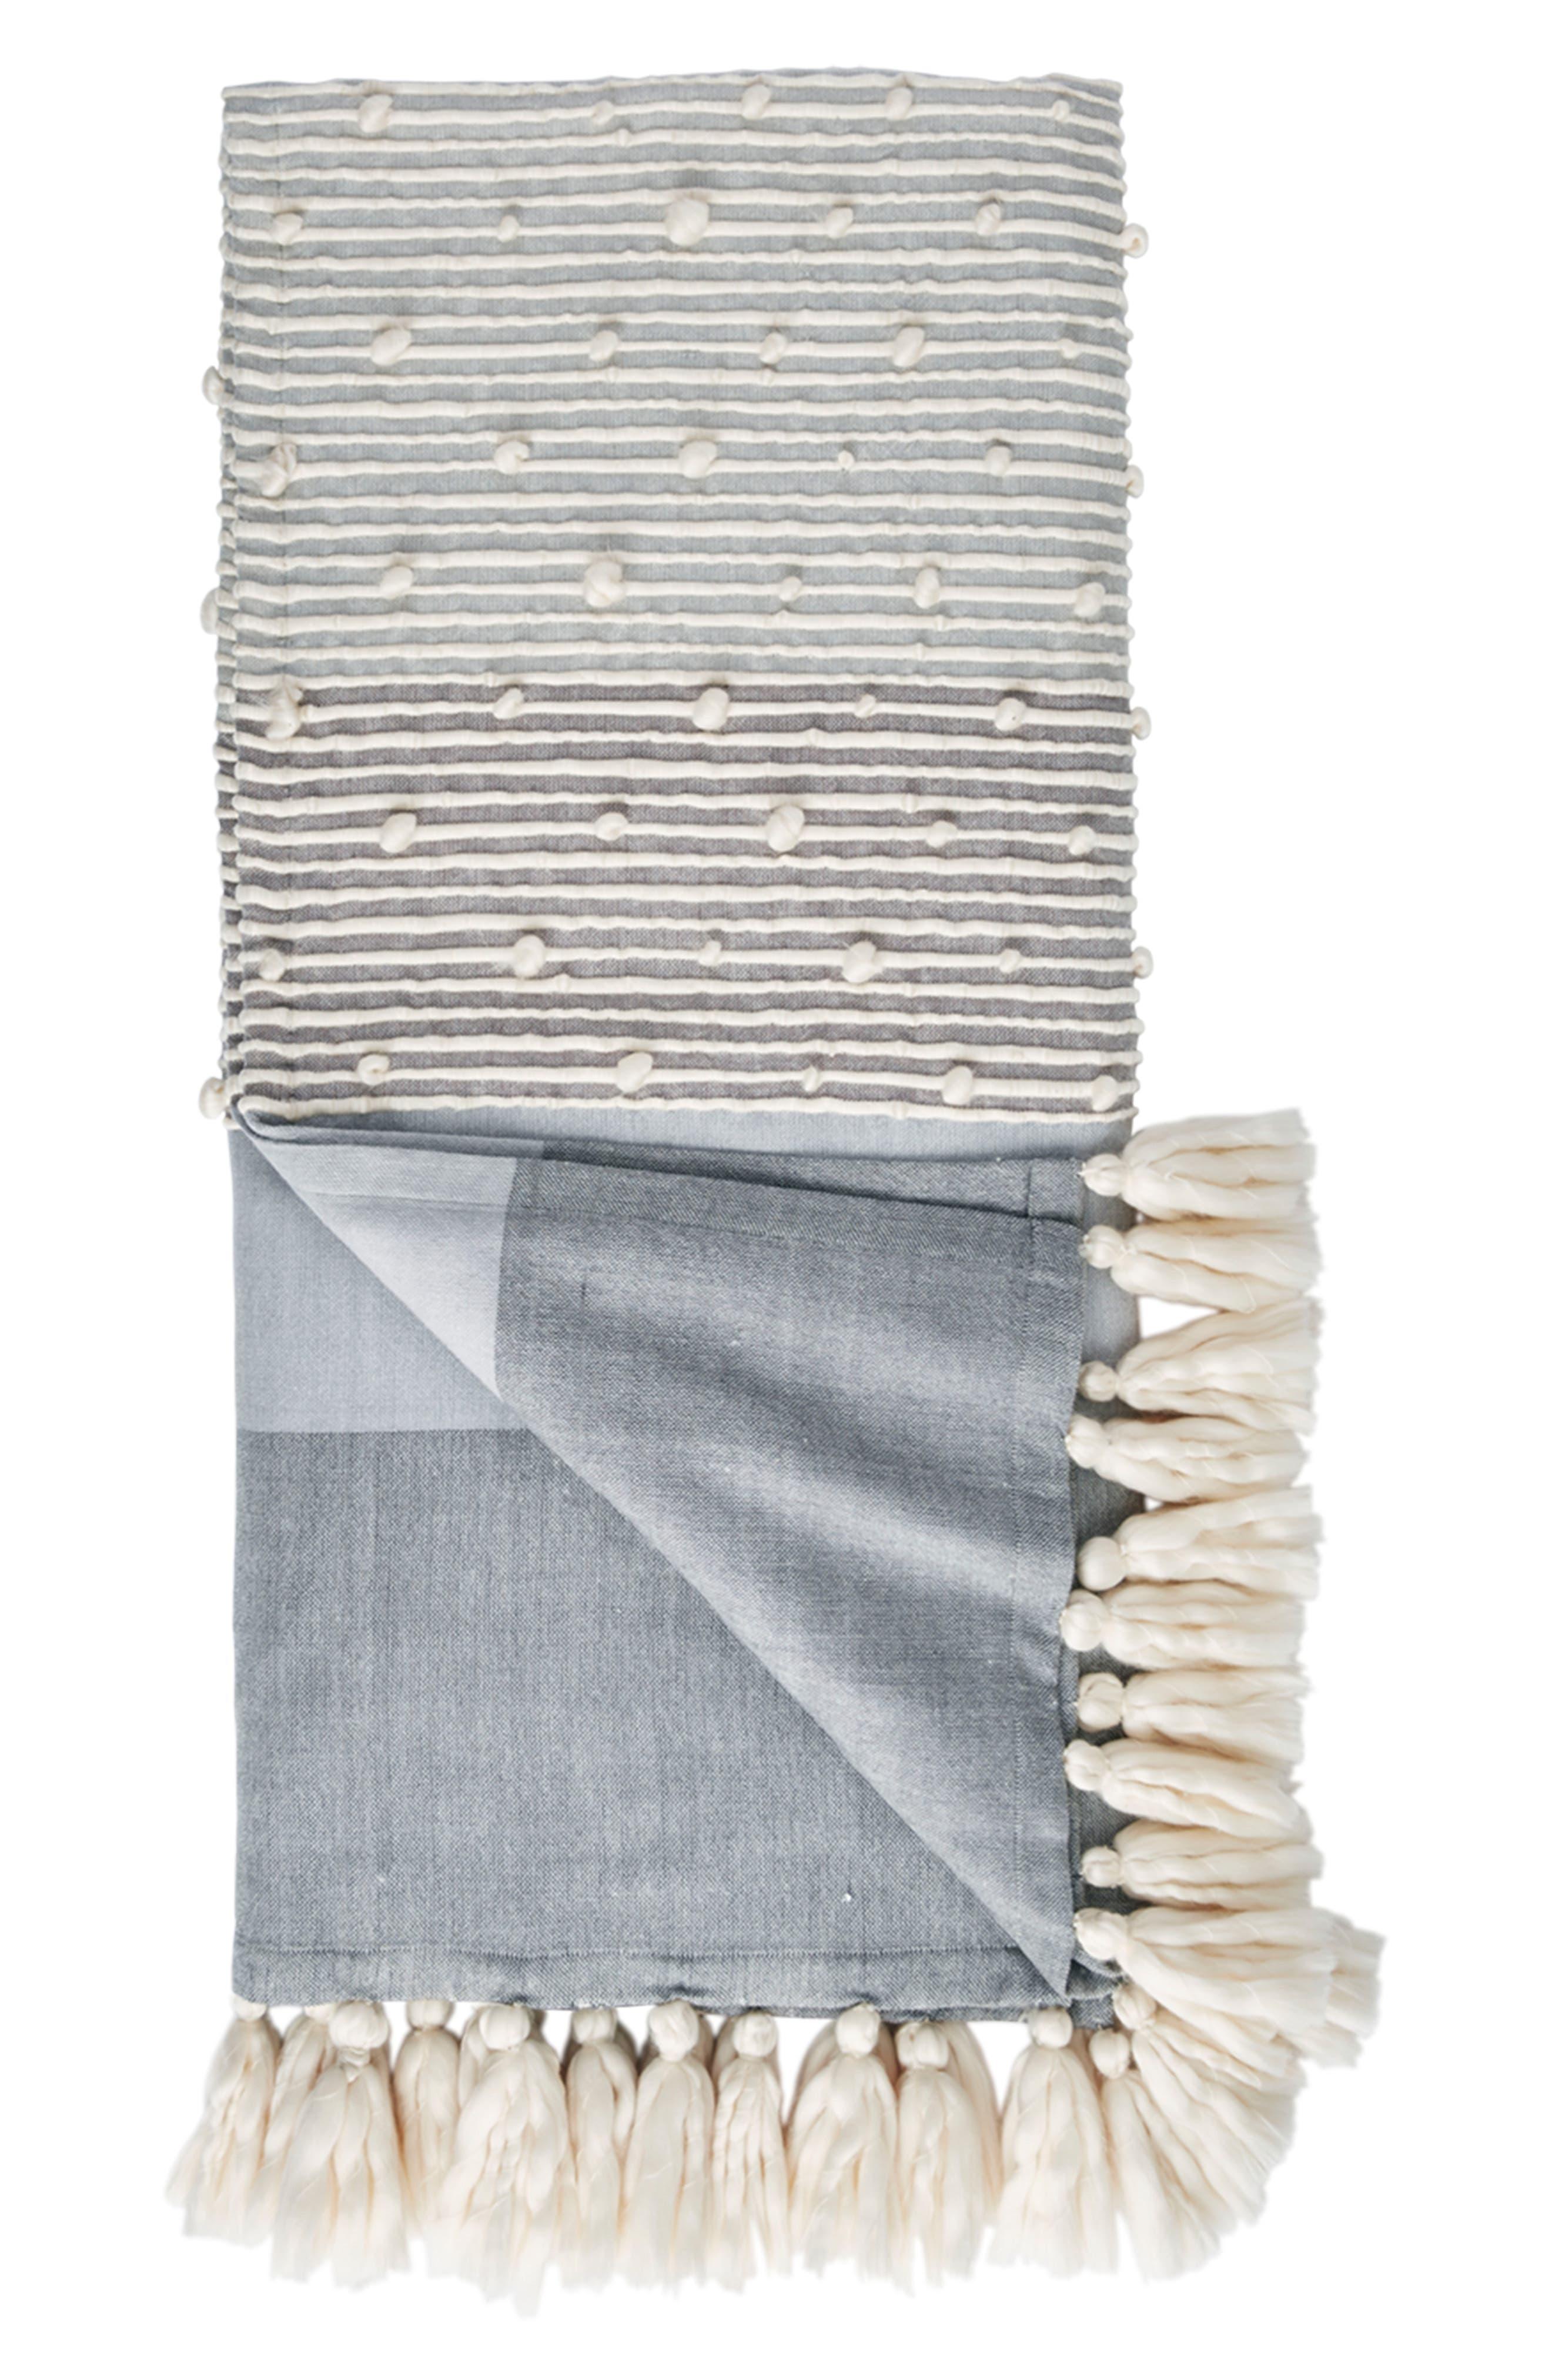 Main Image - DwellStudio Tallulah Throw Blanket